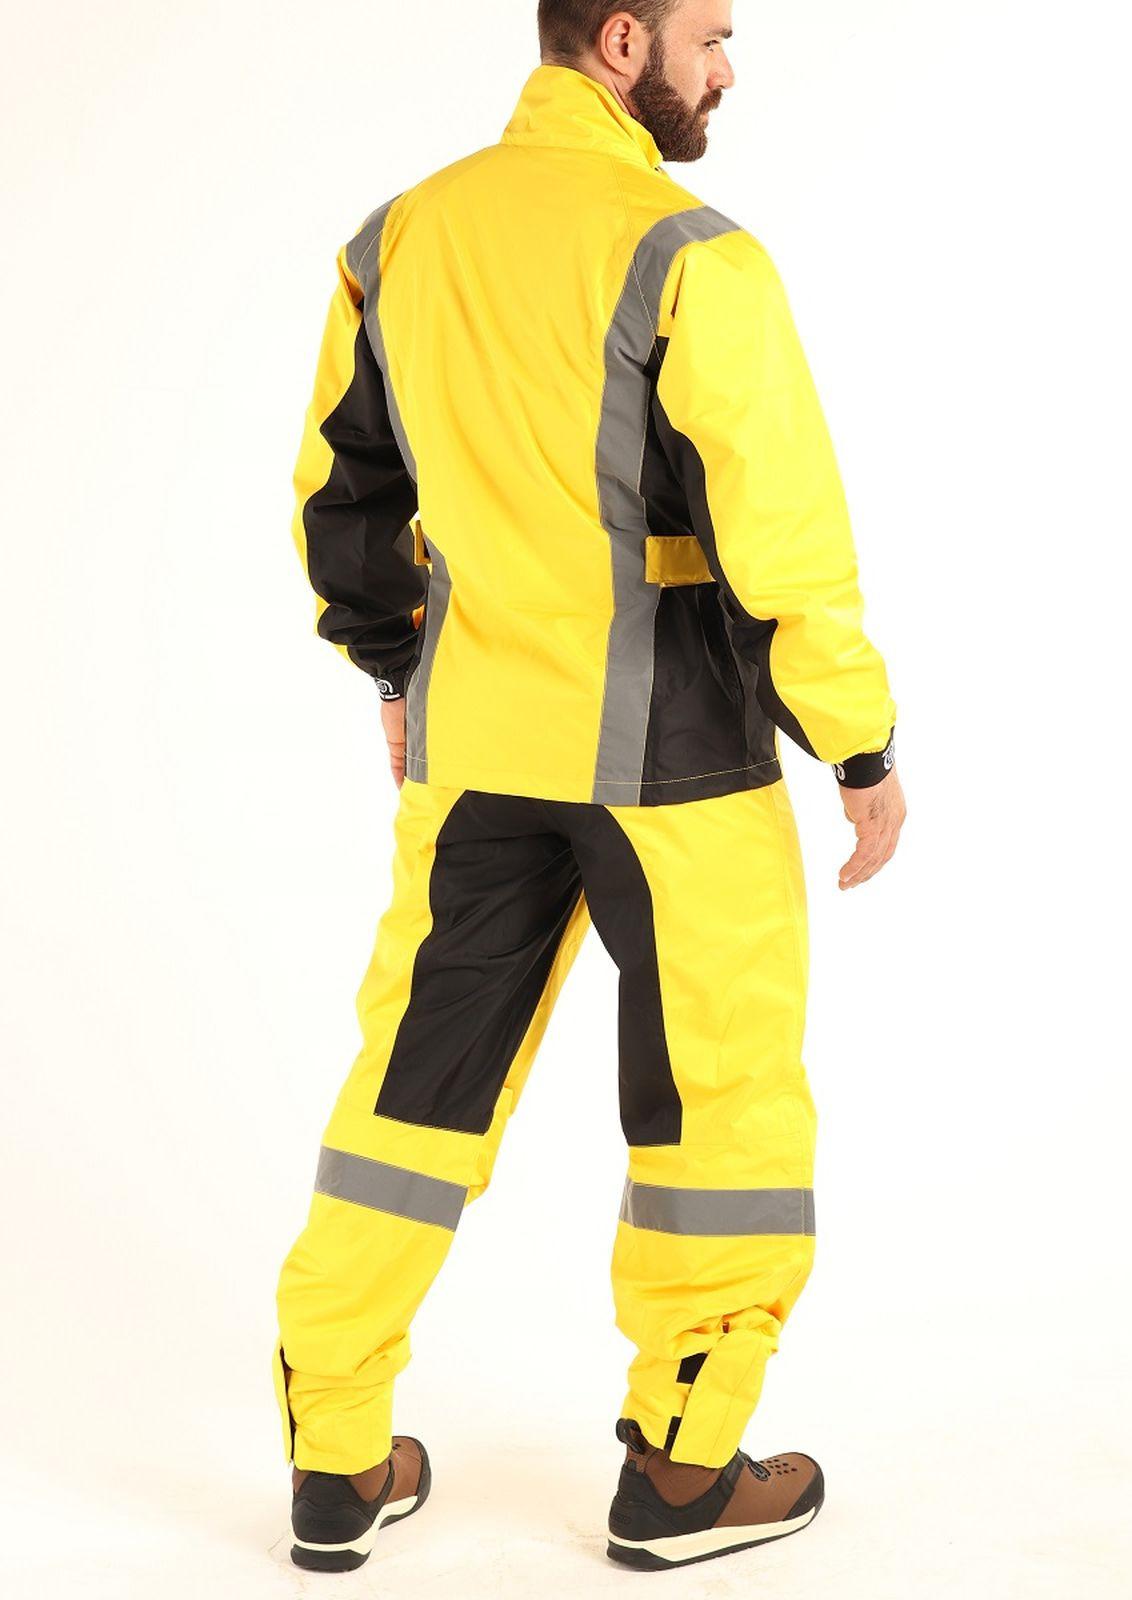 Мотодождевик мужской Starks Light Rain Membran, LC0085, желтый, размер XS Starks